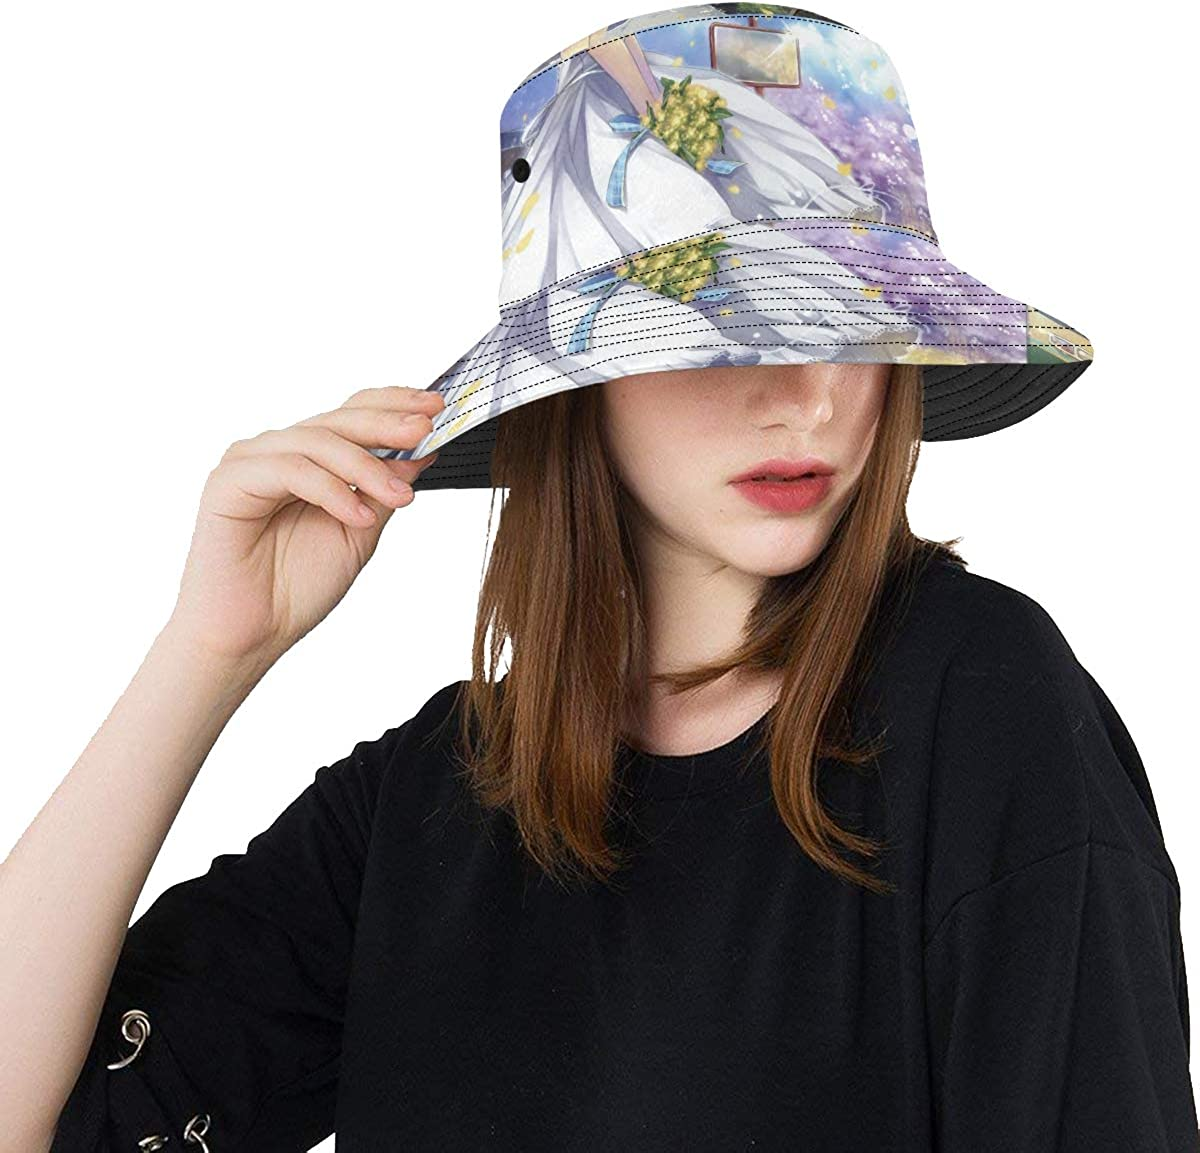 Teen Girls Bucket Hats Fisherman Caps Women Wide Brim Sun Hats